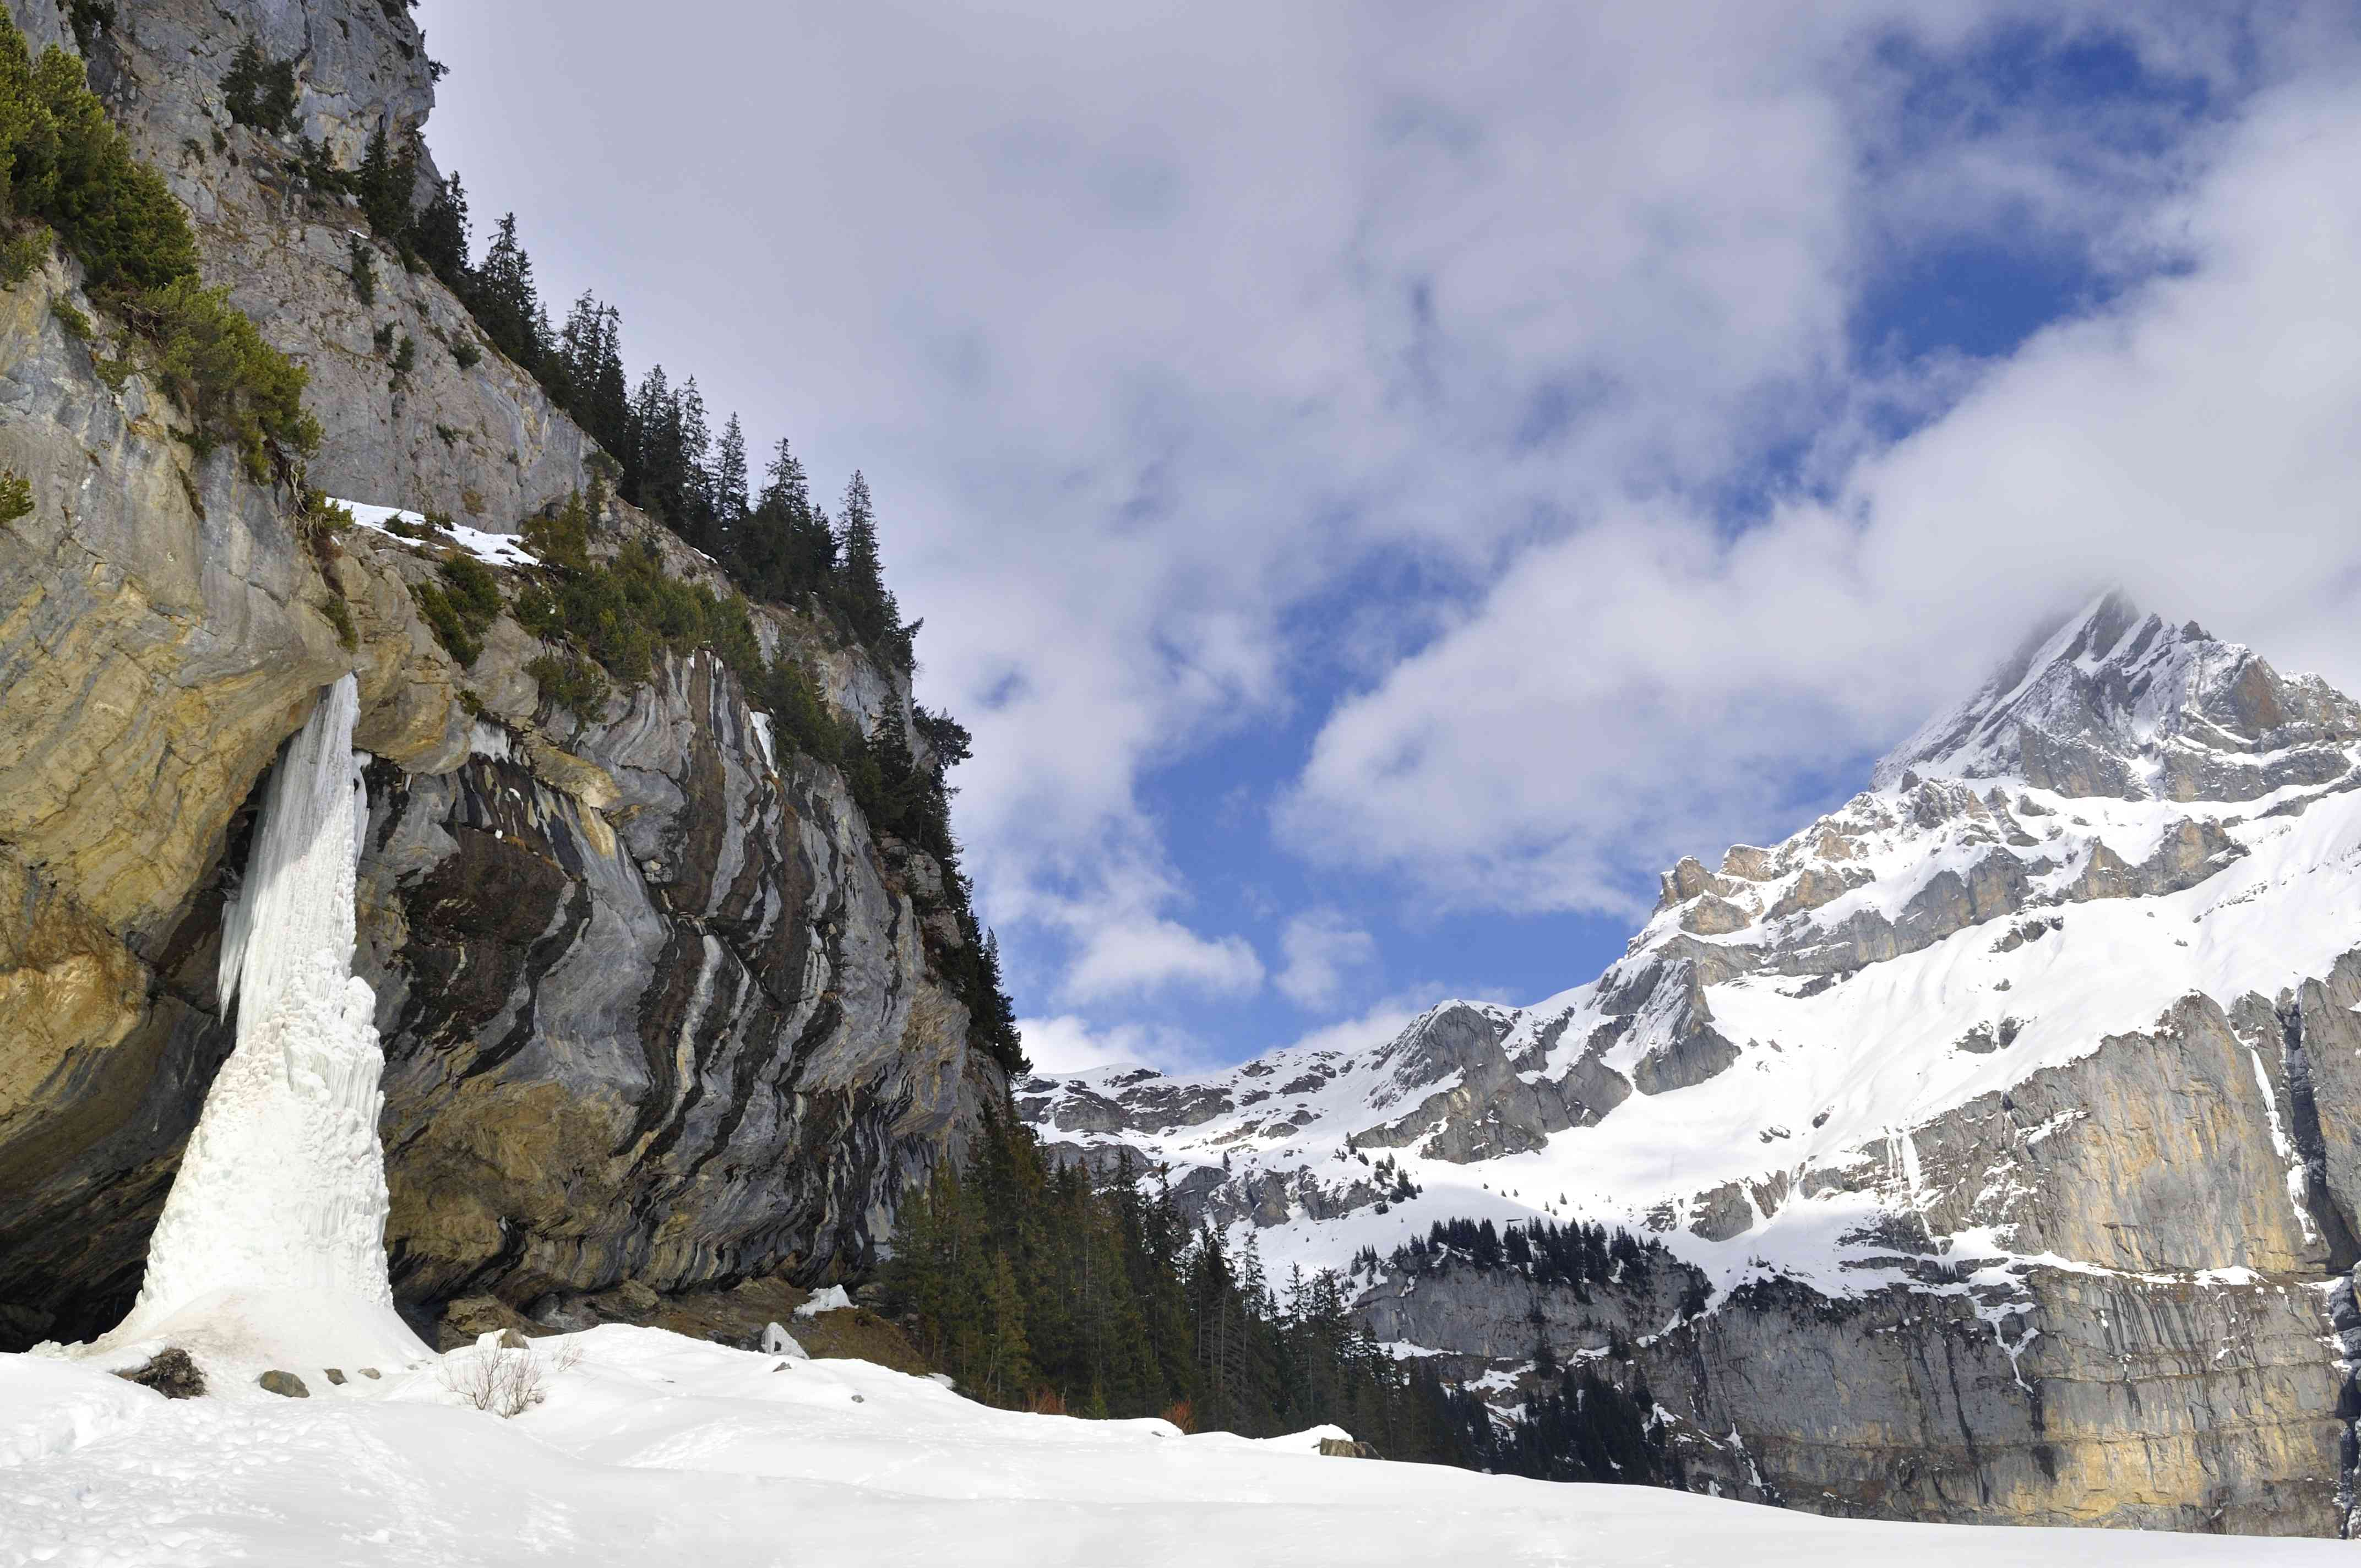 Frozen waterfall and mountains at Oeschiwald Lake